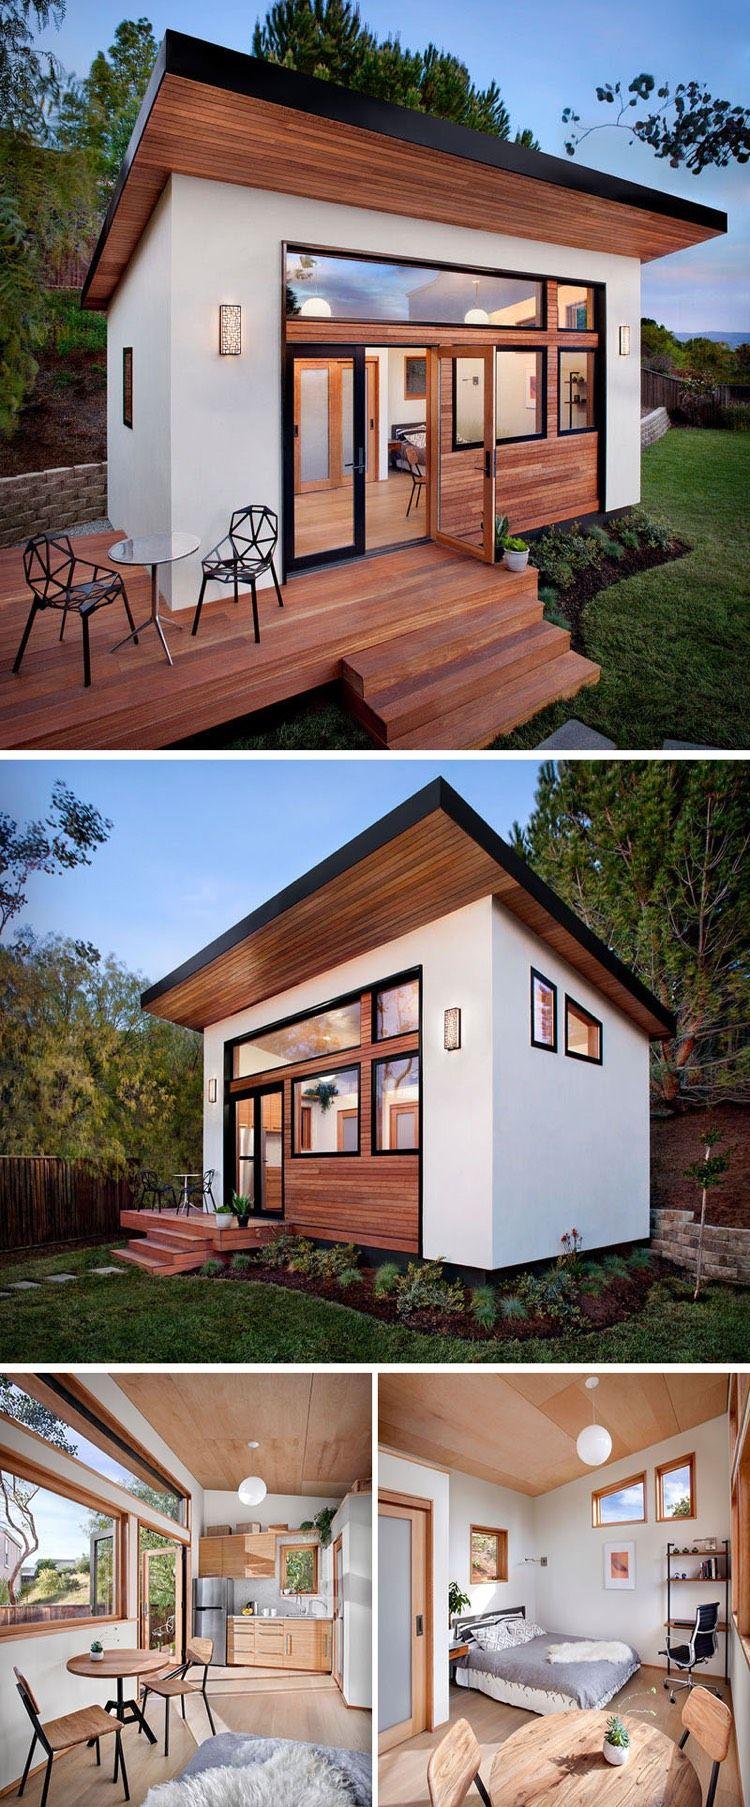 14 moderne Gartenhäuser, wo man in Ruhe arbeiten oder